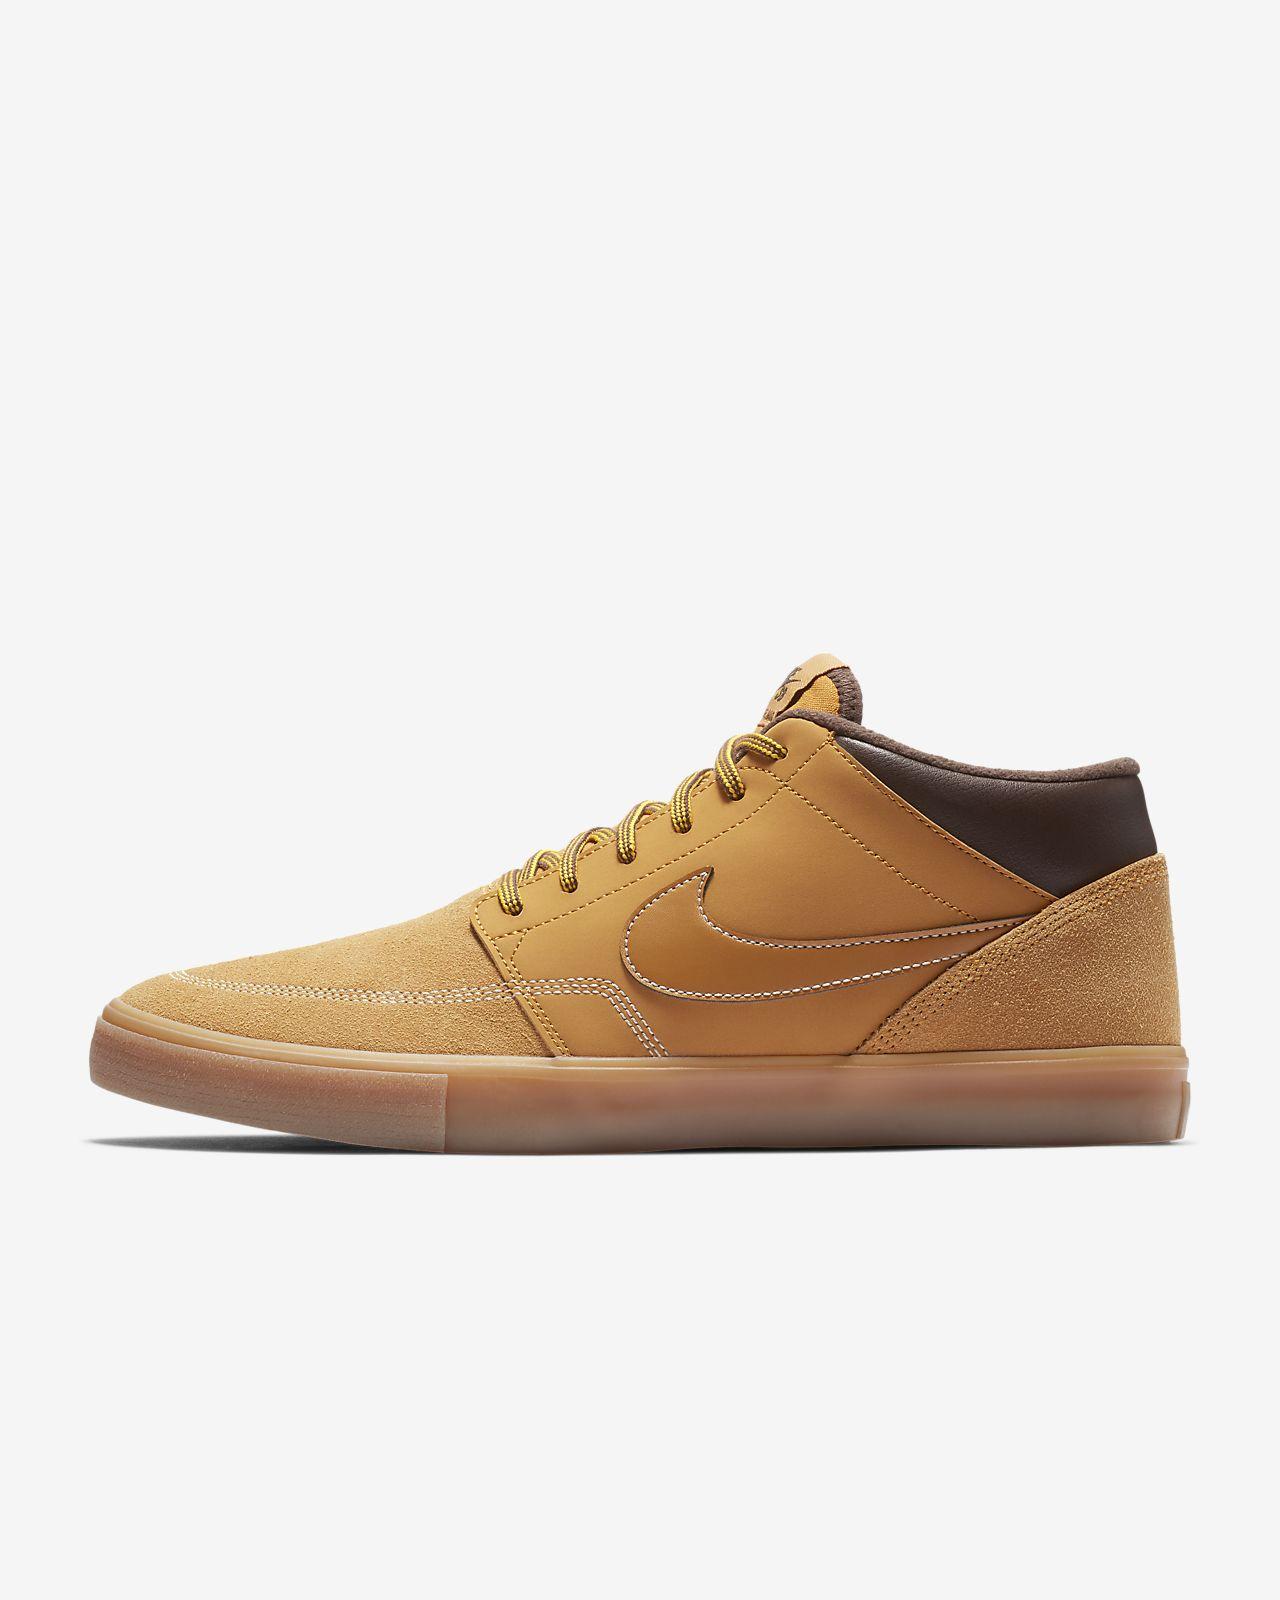 Sapatilhas de skateboard Nike SB Portmore II Solarsoft Bota